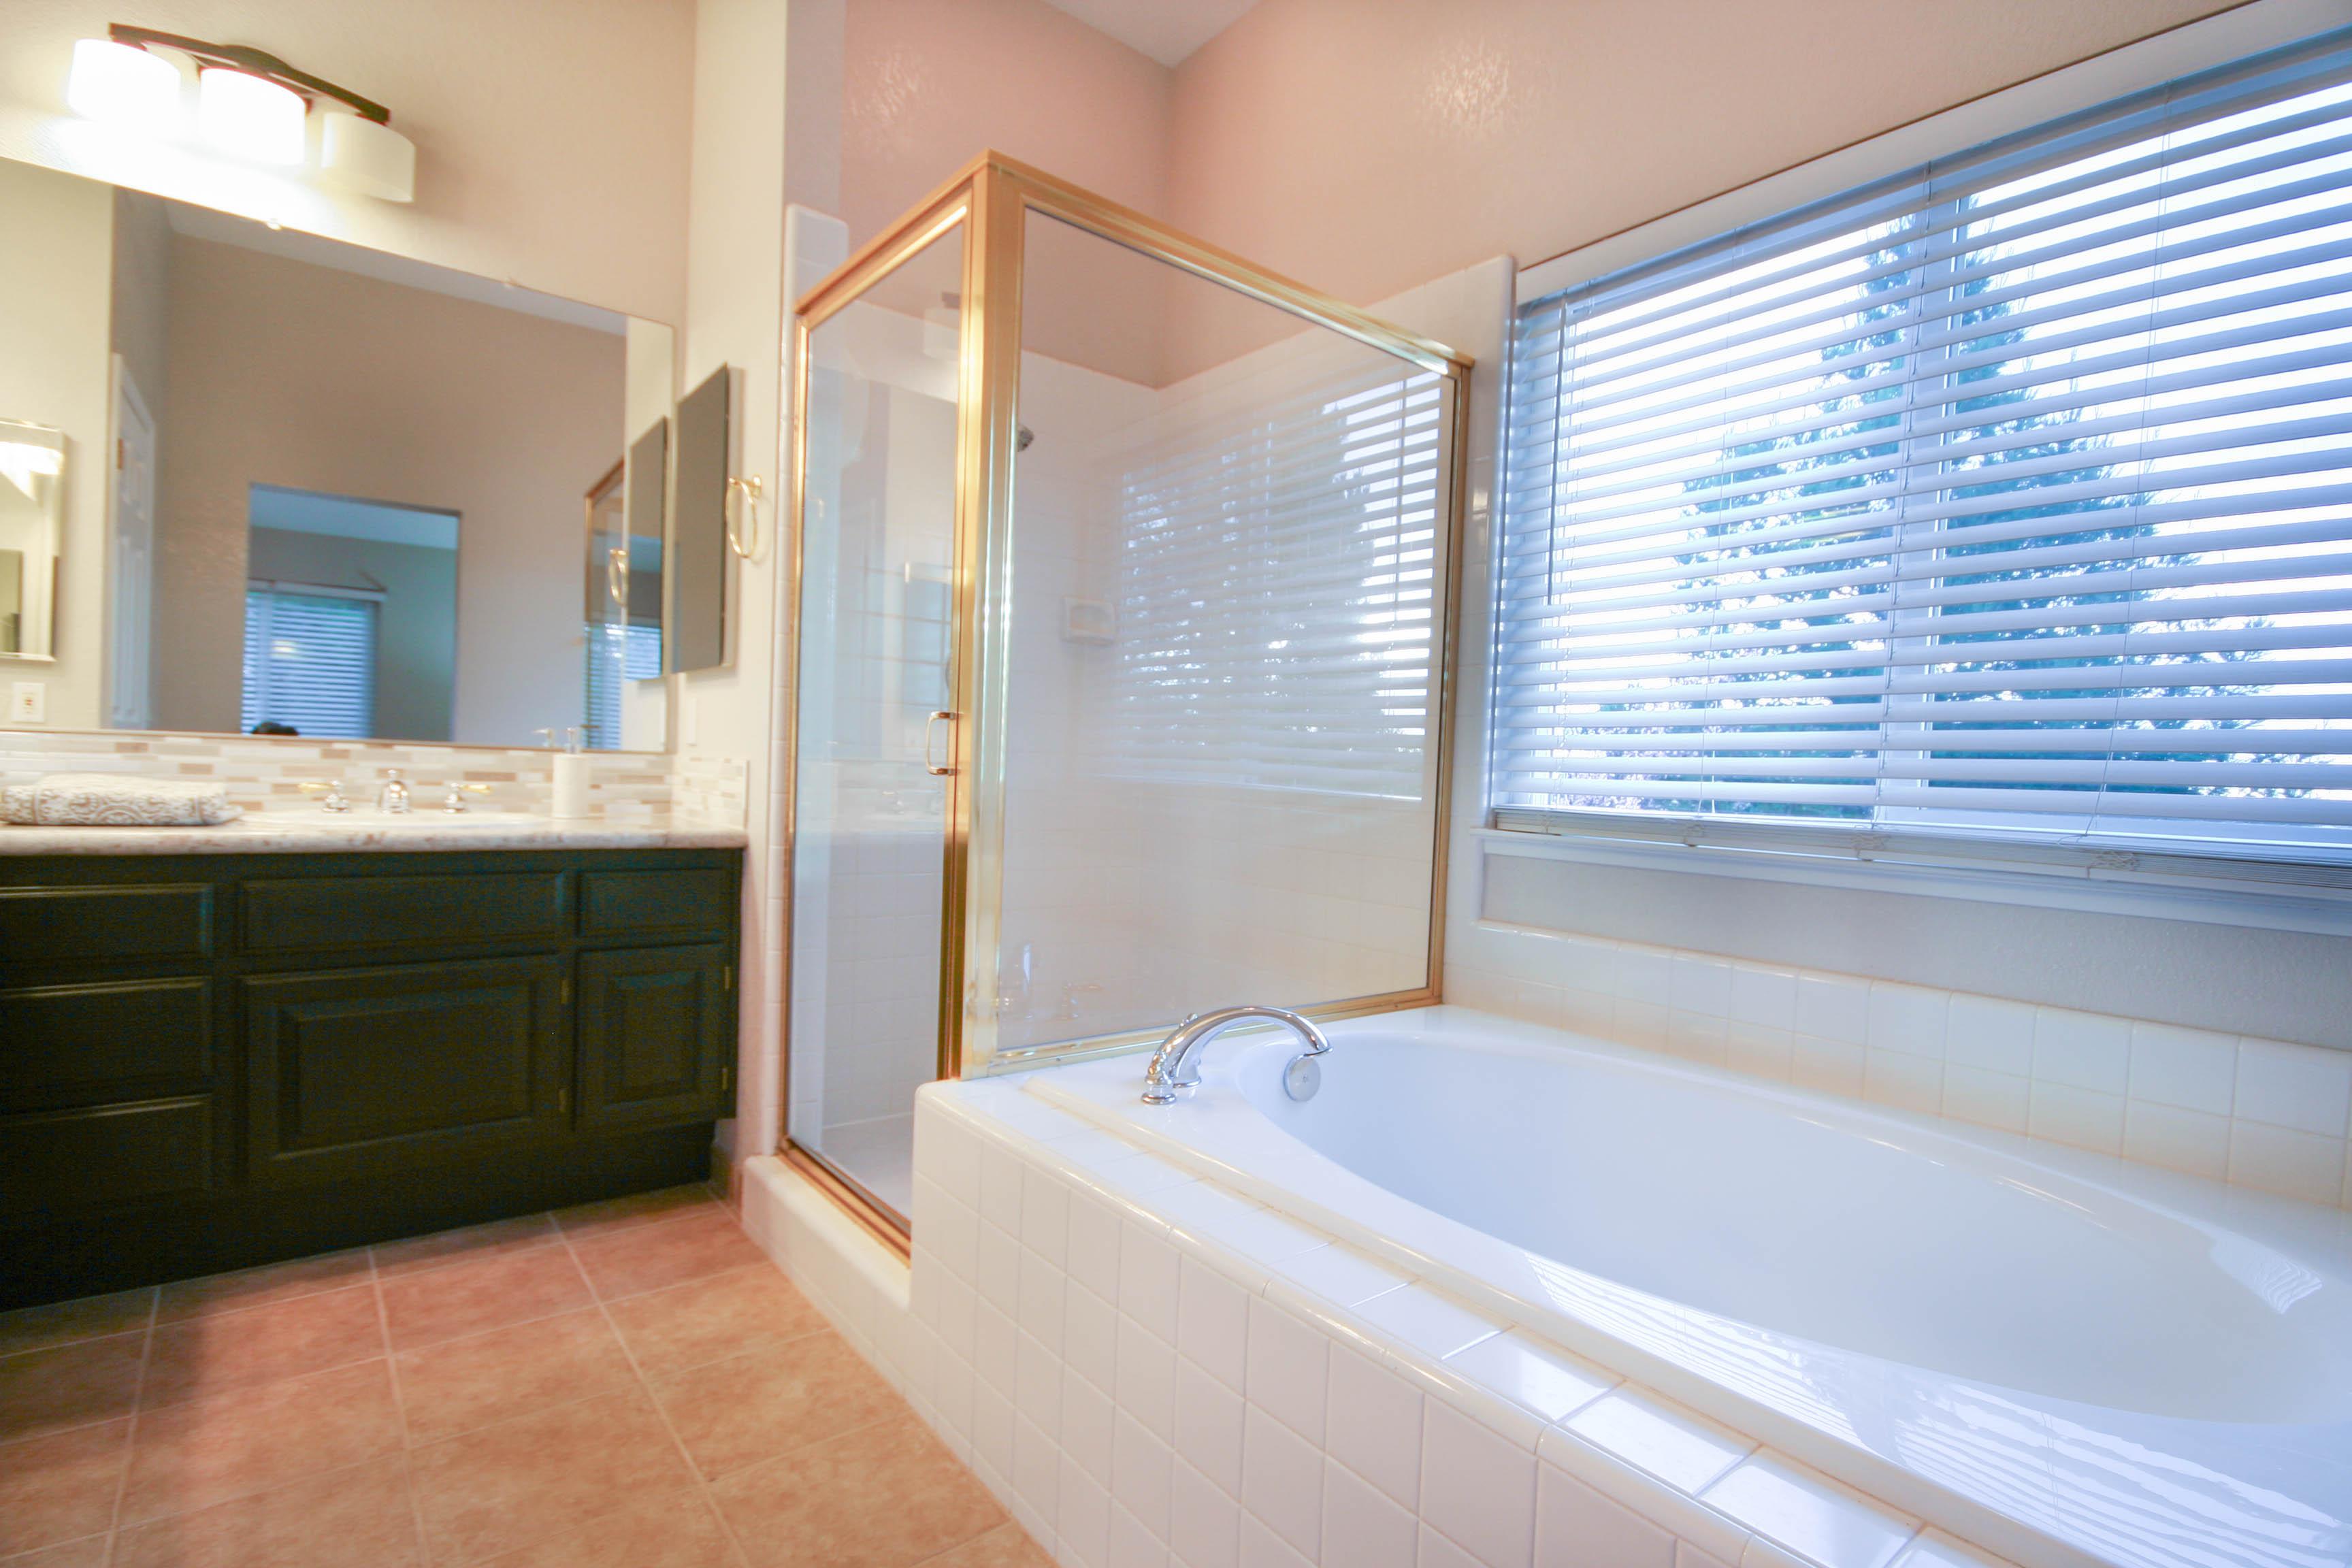 locations true sacramento supply plumbing ry value roystorefront standard